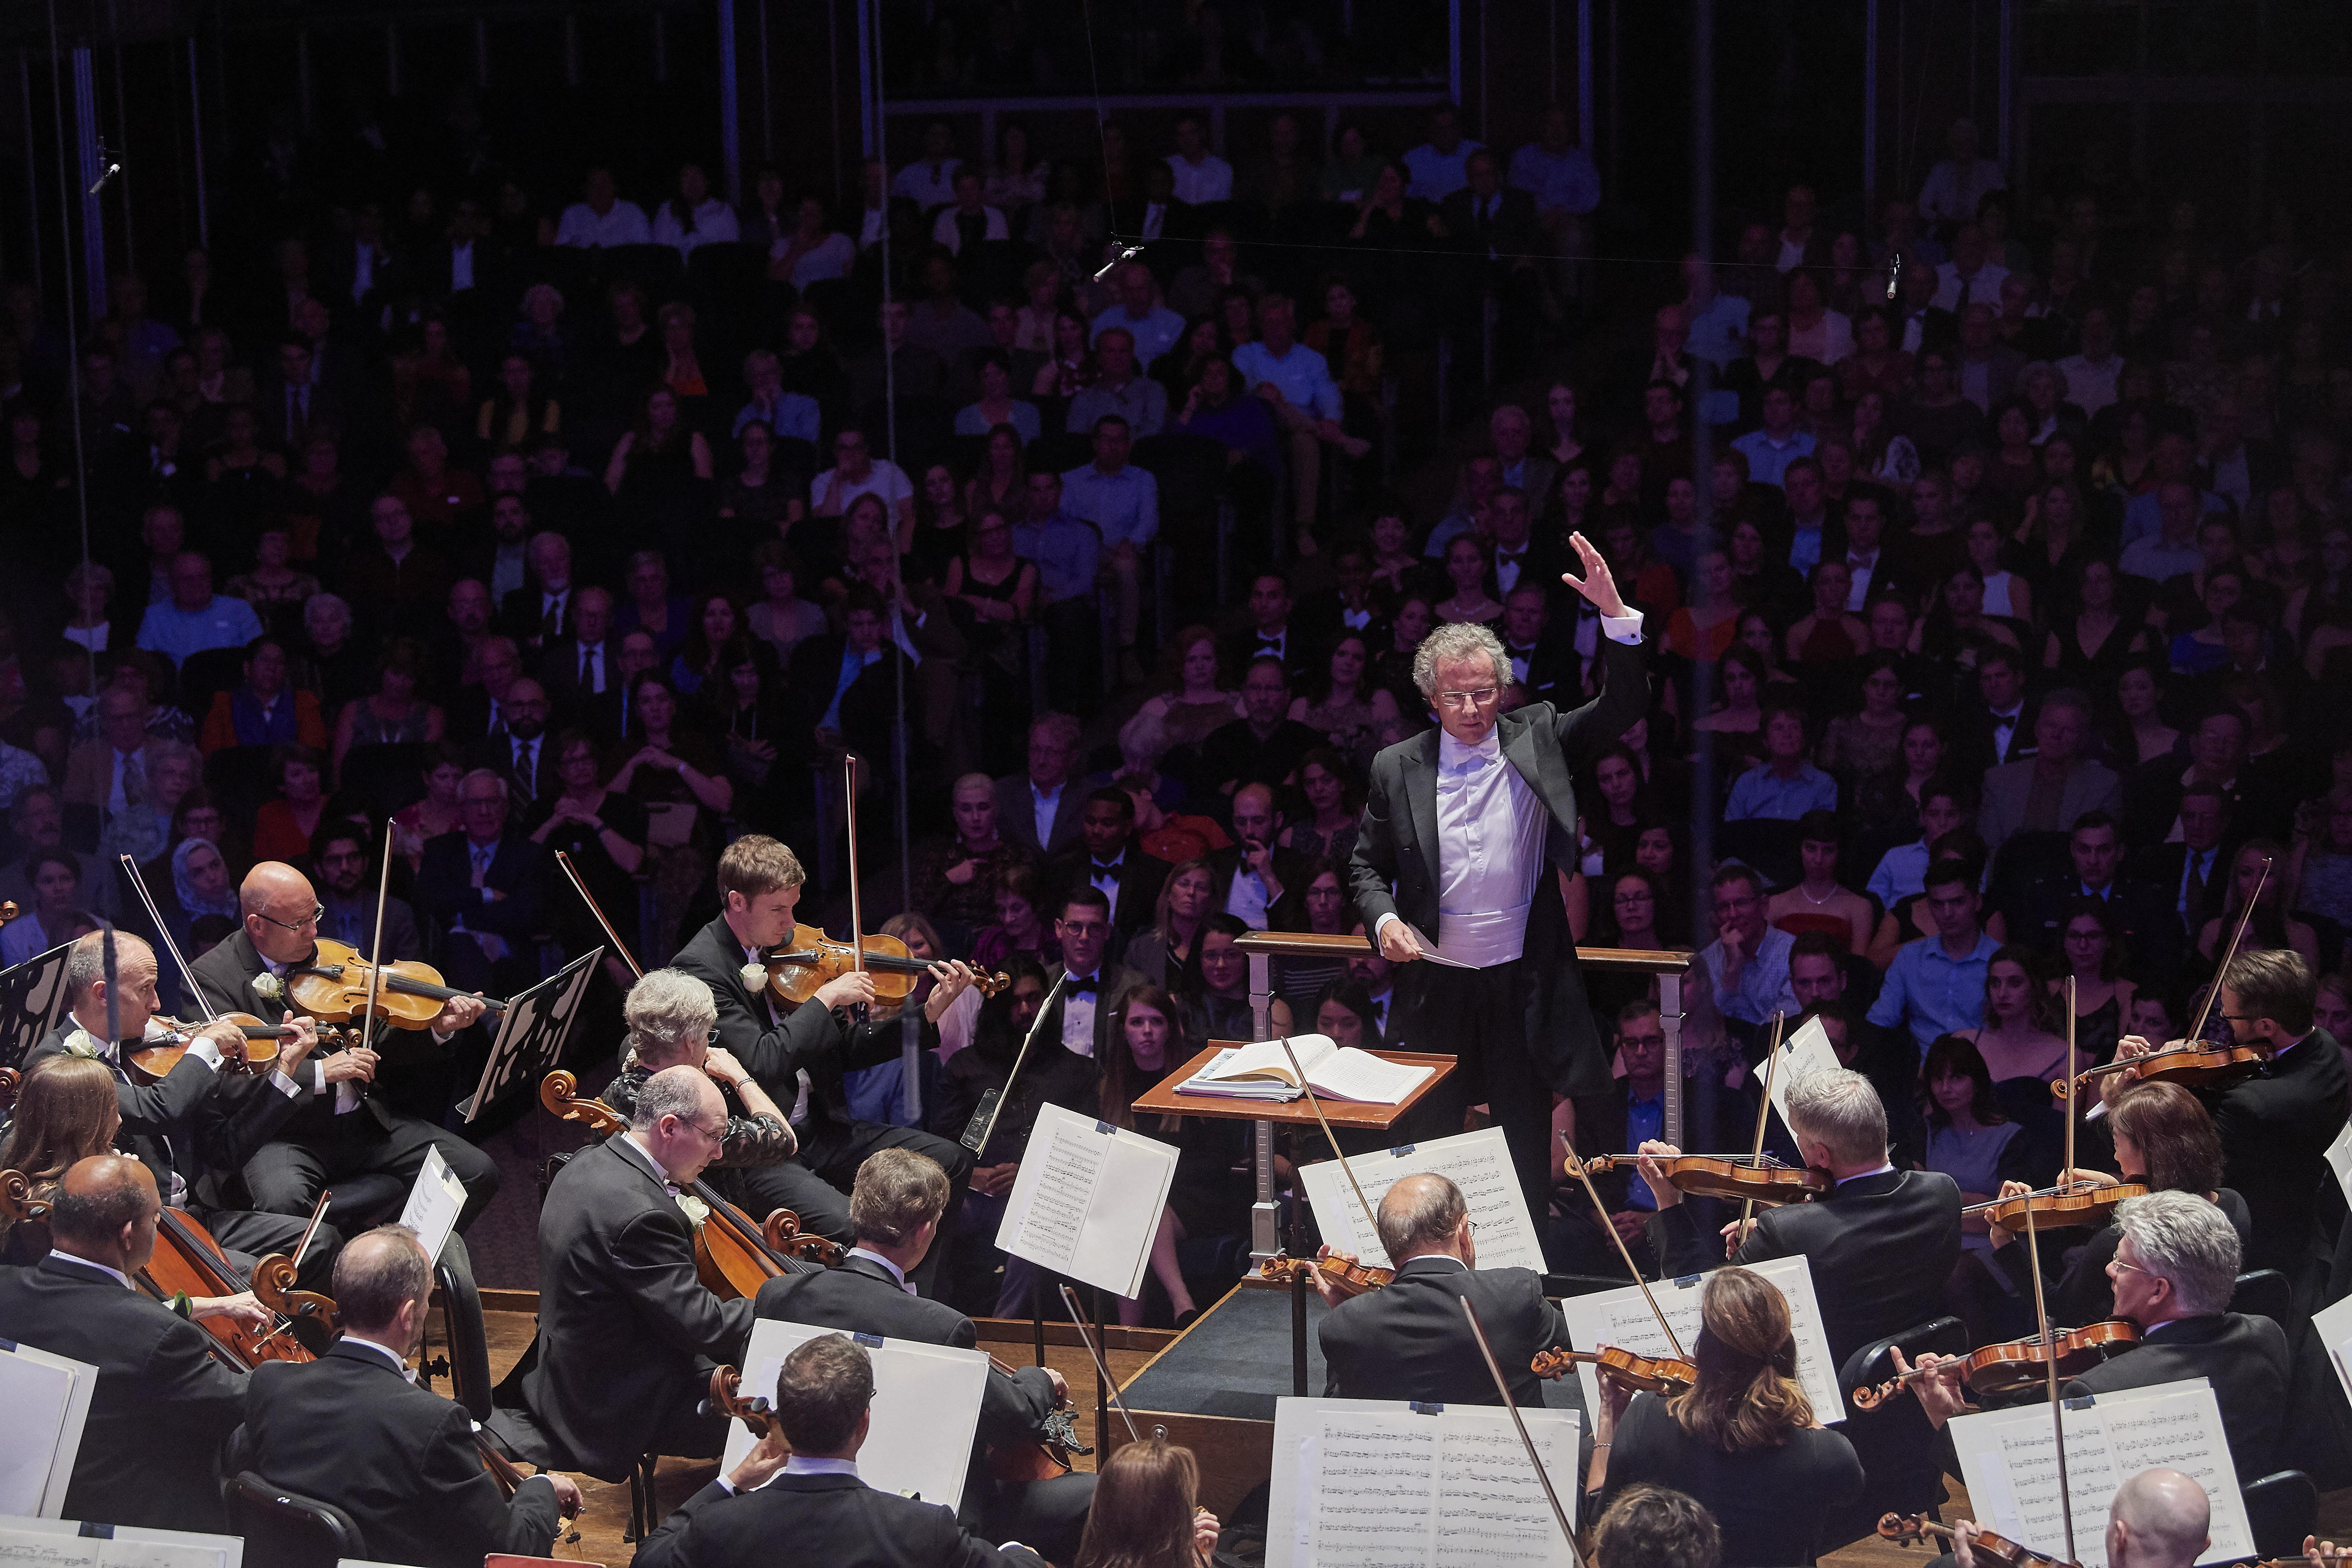 Music Director, Franz Welser-Möst leads The Cleveland Orchestra